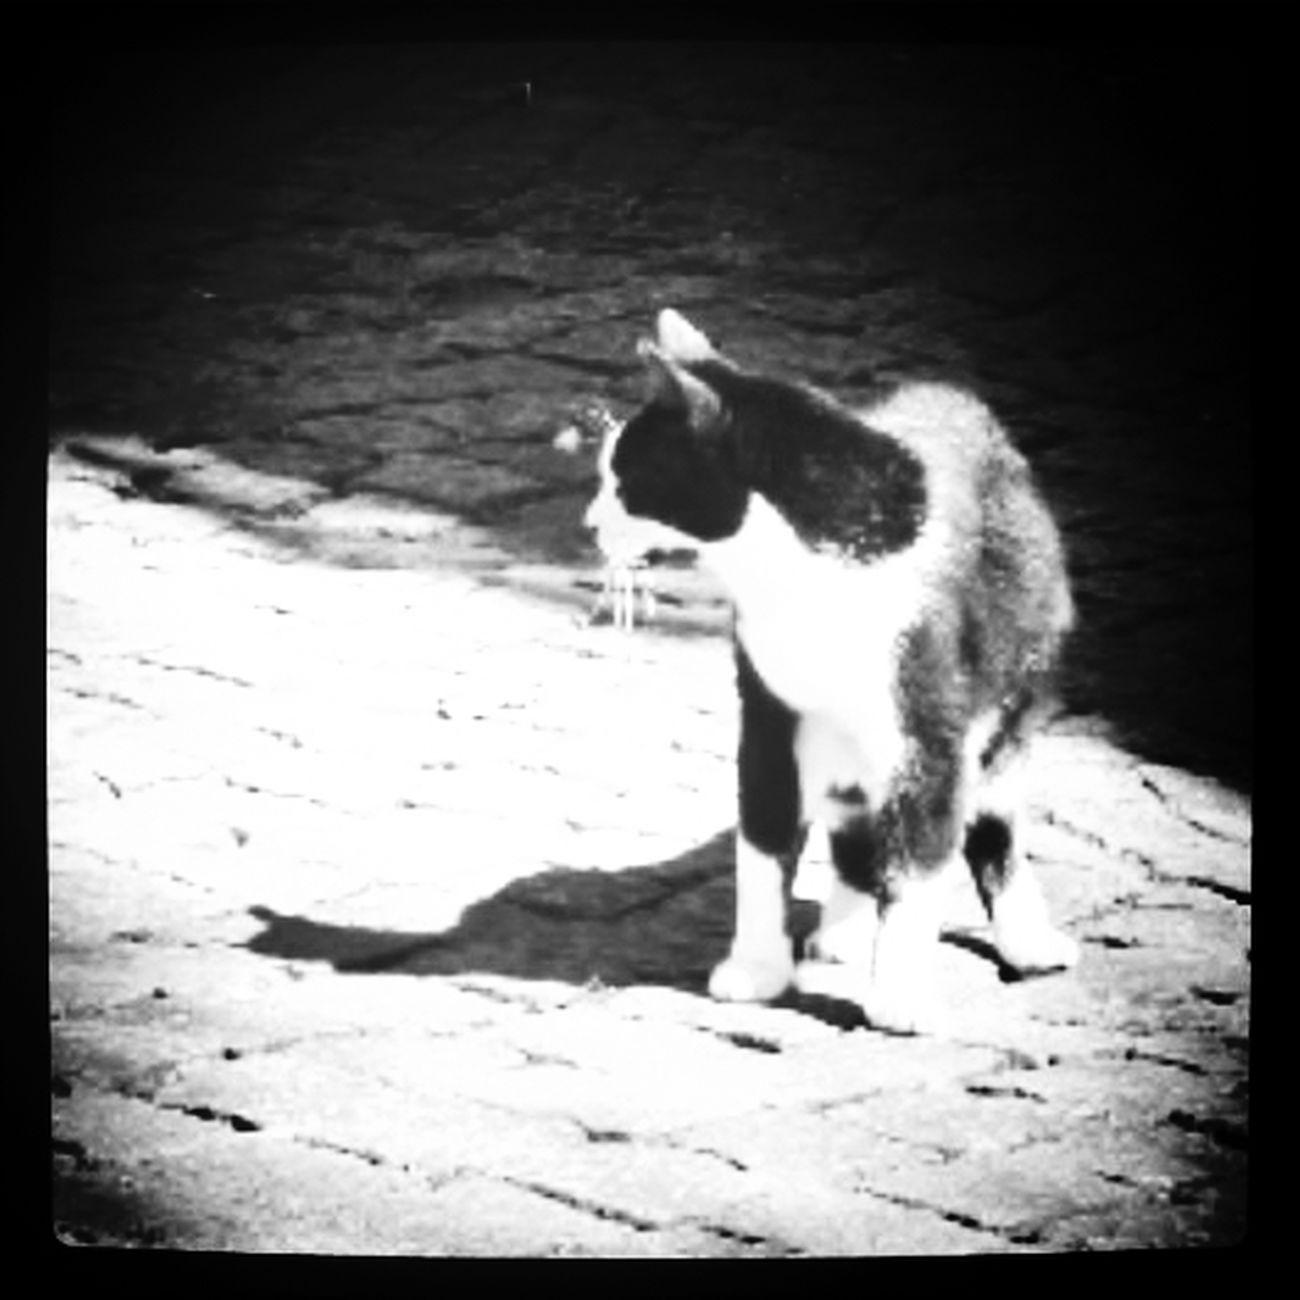 Se tu vieni, per esempio, tutte le mattine alle dieci, dalle nove comincerò a essere felice... Cat♡ Jornalistasdeimagens Bnw_collection Enjoying Life